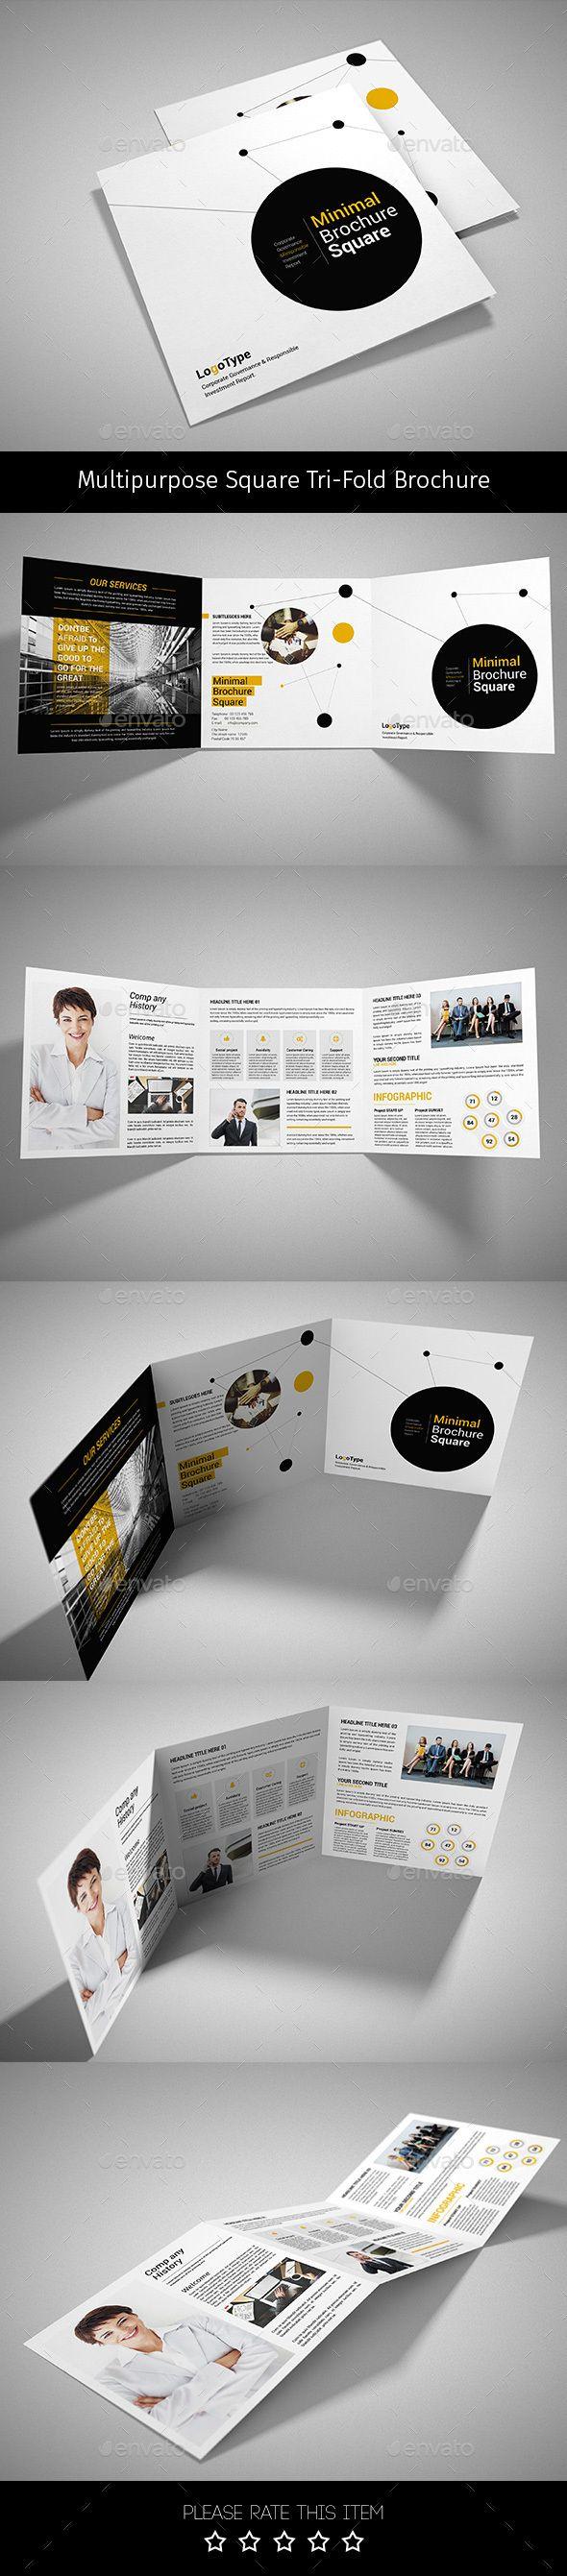 Corporate Tri-fold Square Brochure Template PSD #design Download: http://graphicriver.net/item/-corporate-trifold-square-brochure-07/14319081?ref=ksioks